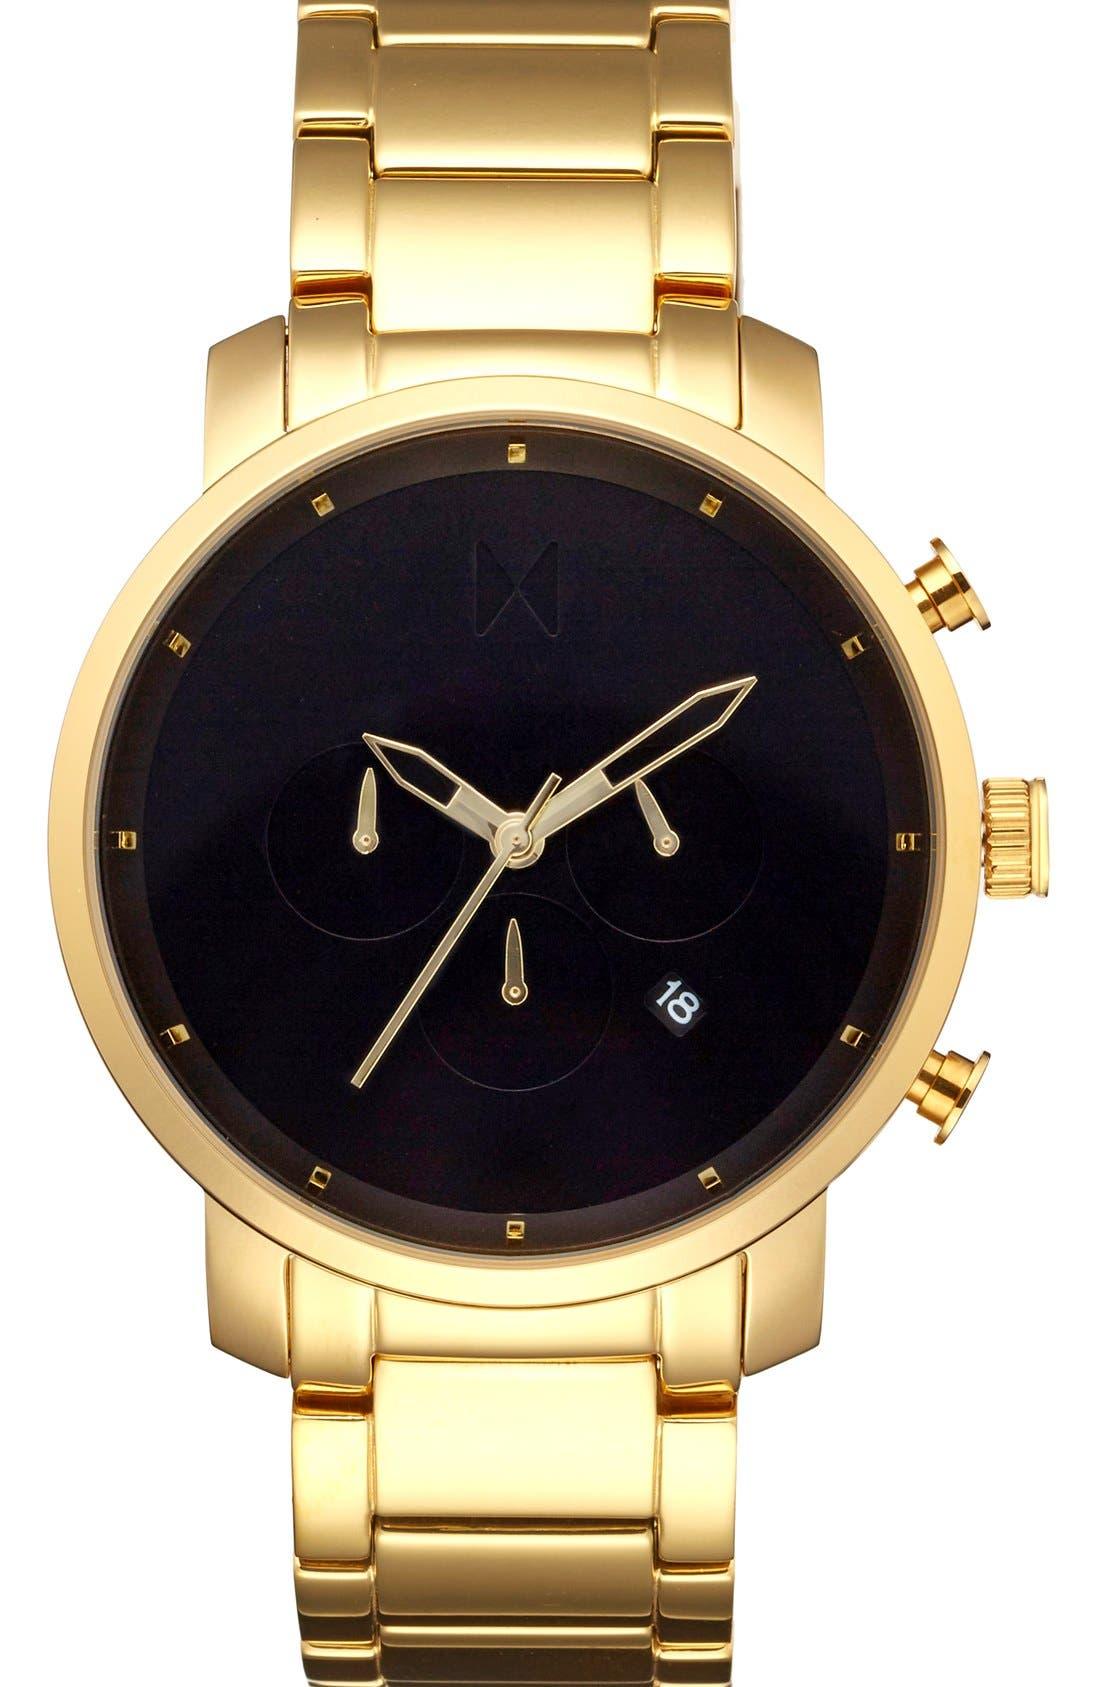 Main Image - MVMT Chronograph Bracelet Watch, 45mm